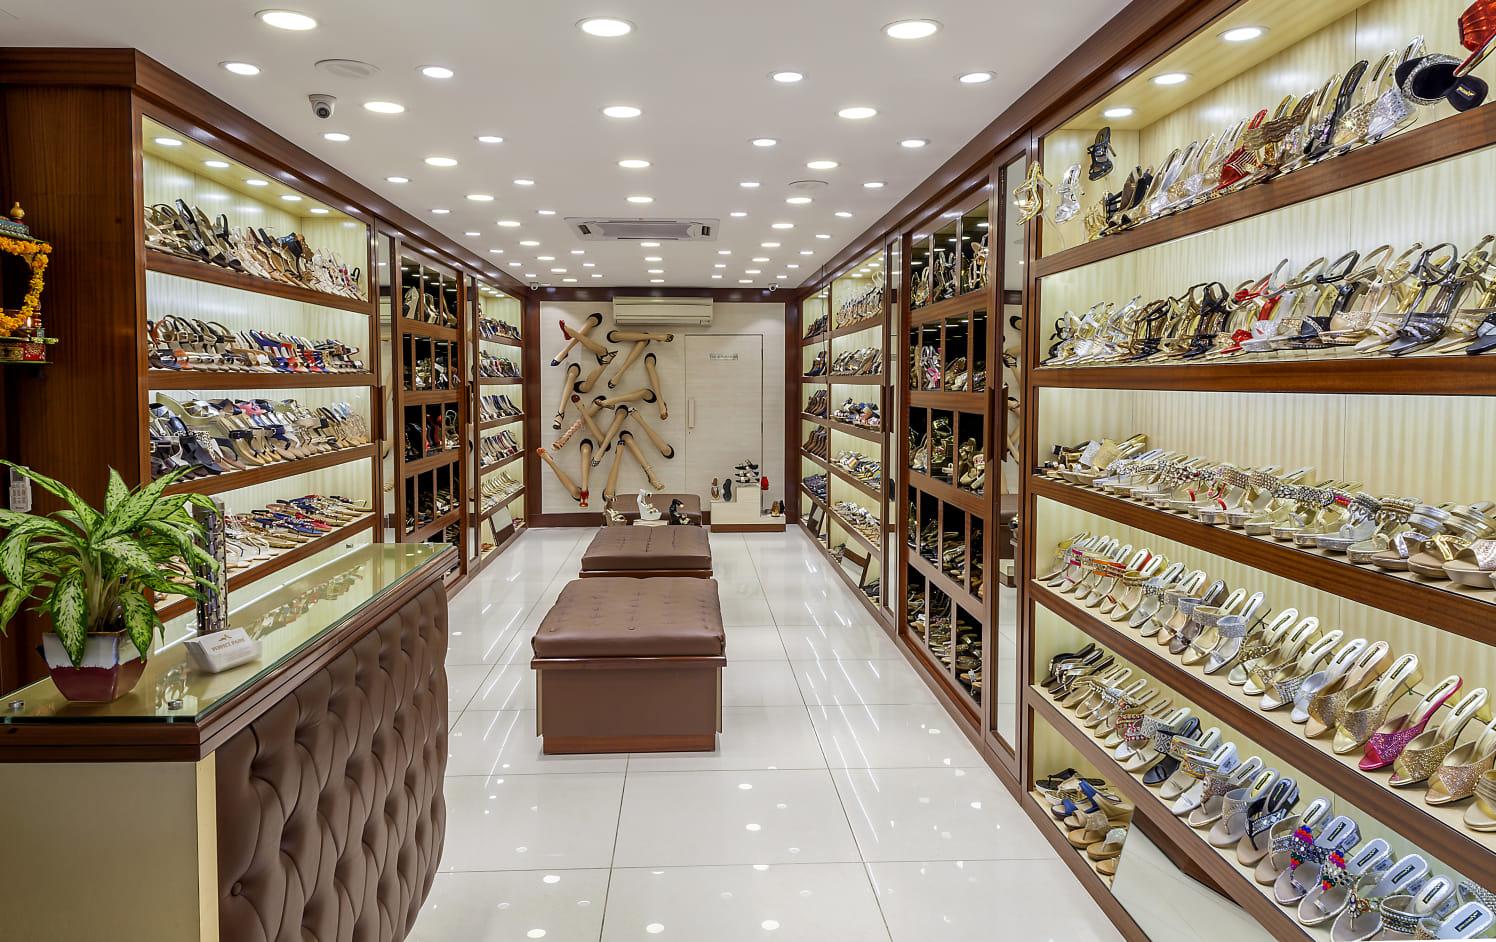 Retro style retail store by Diya Kochhar